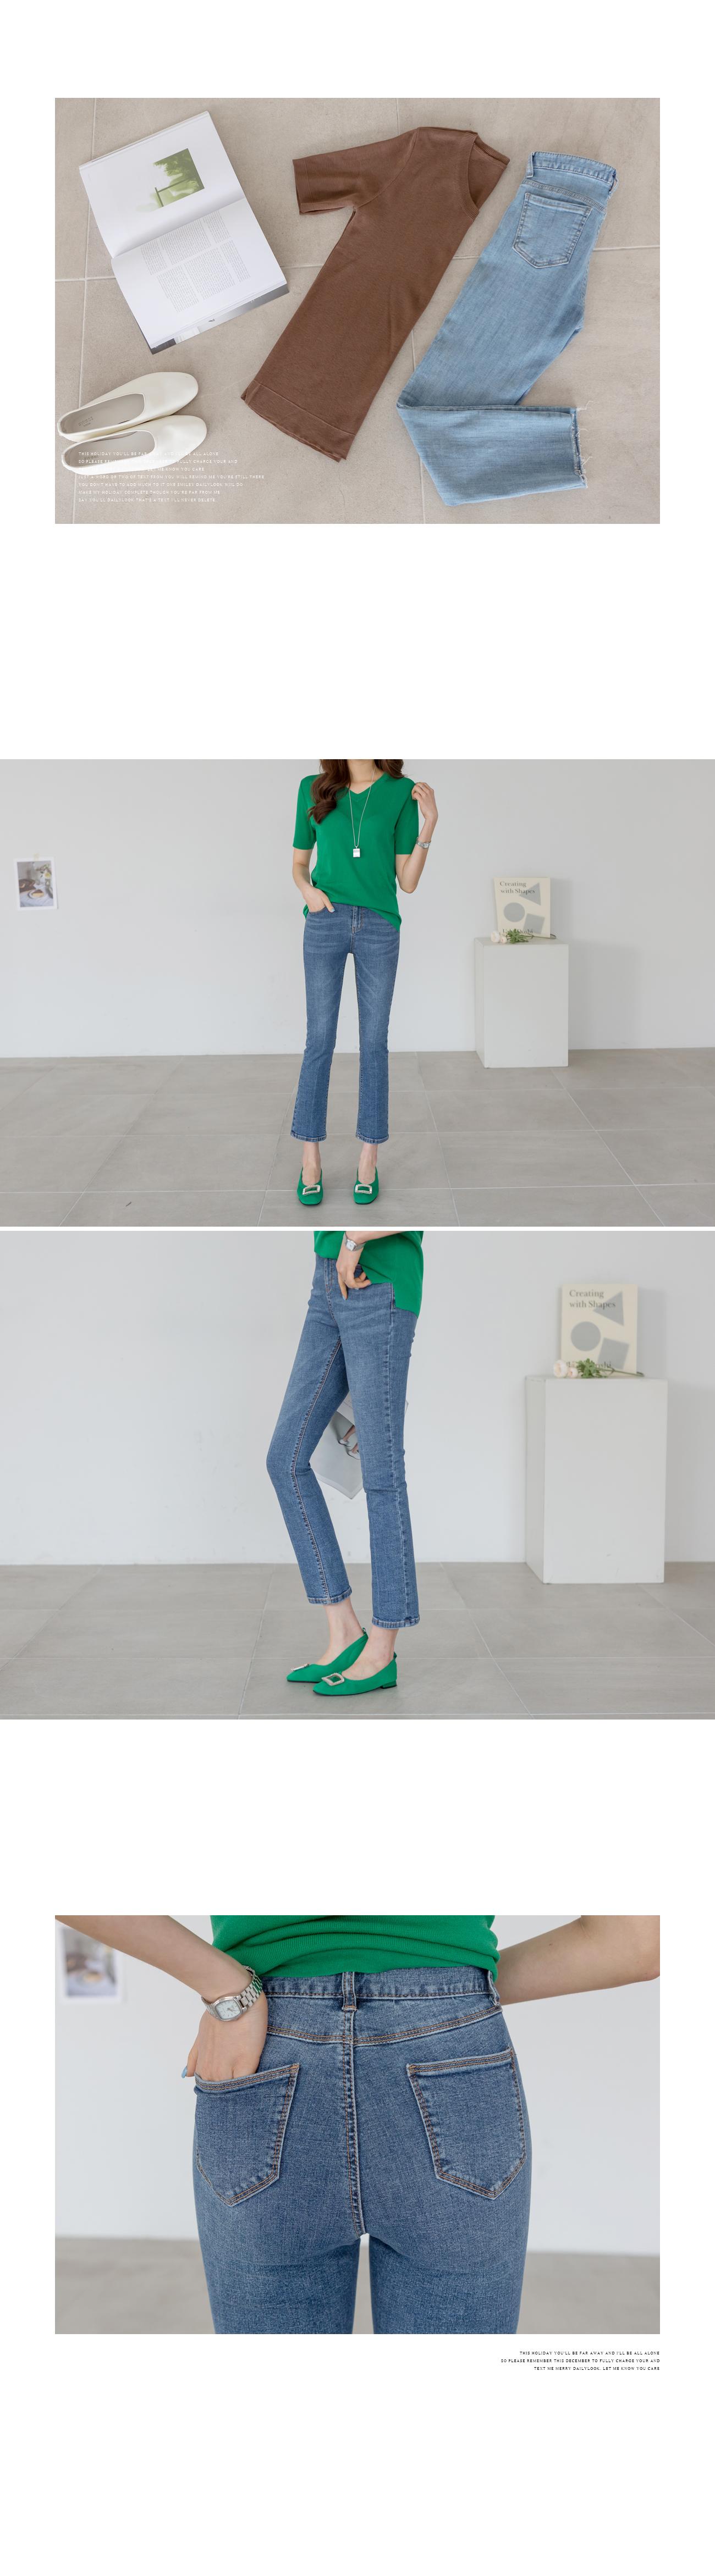 Daily semi-boots denim pants #75284 medium size S available